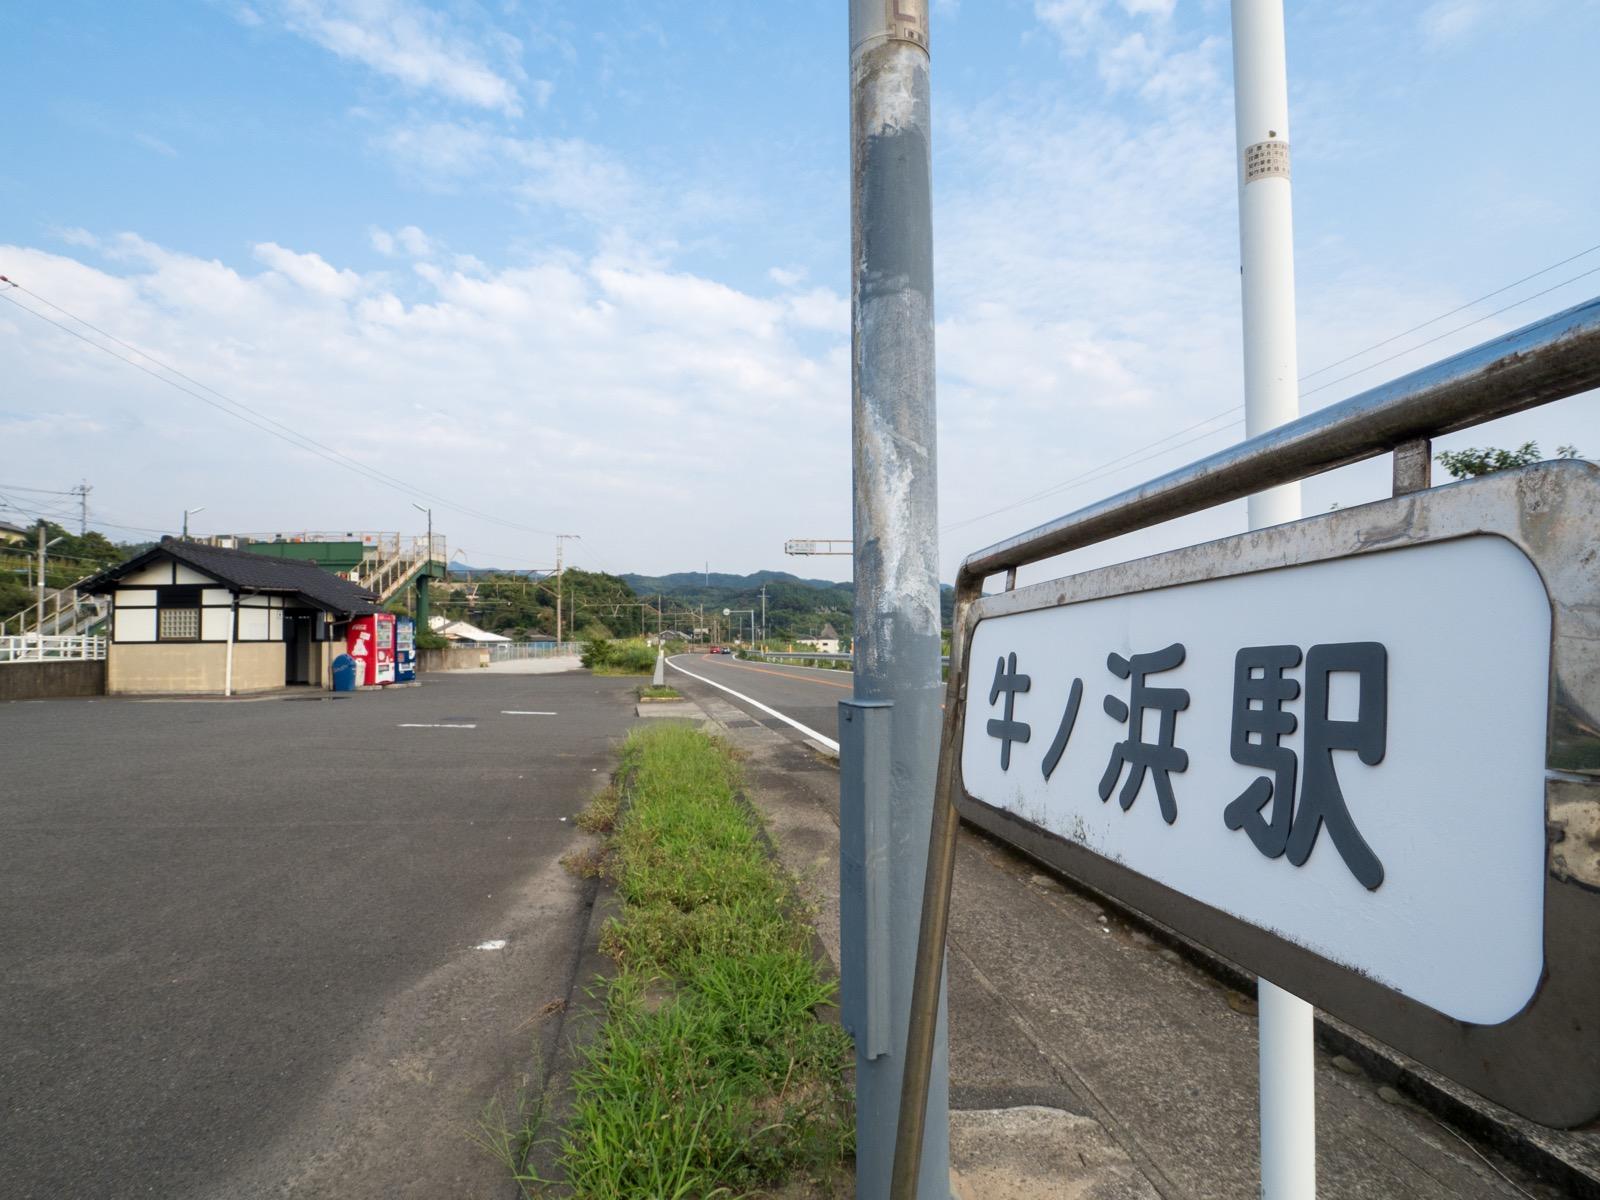 牛ノ浜駅前